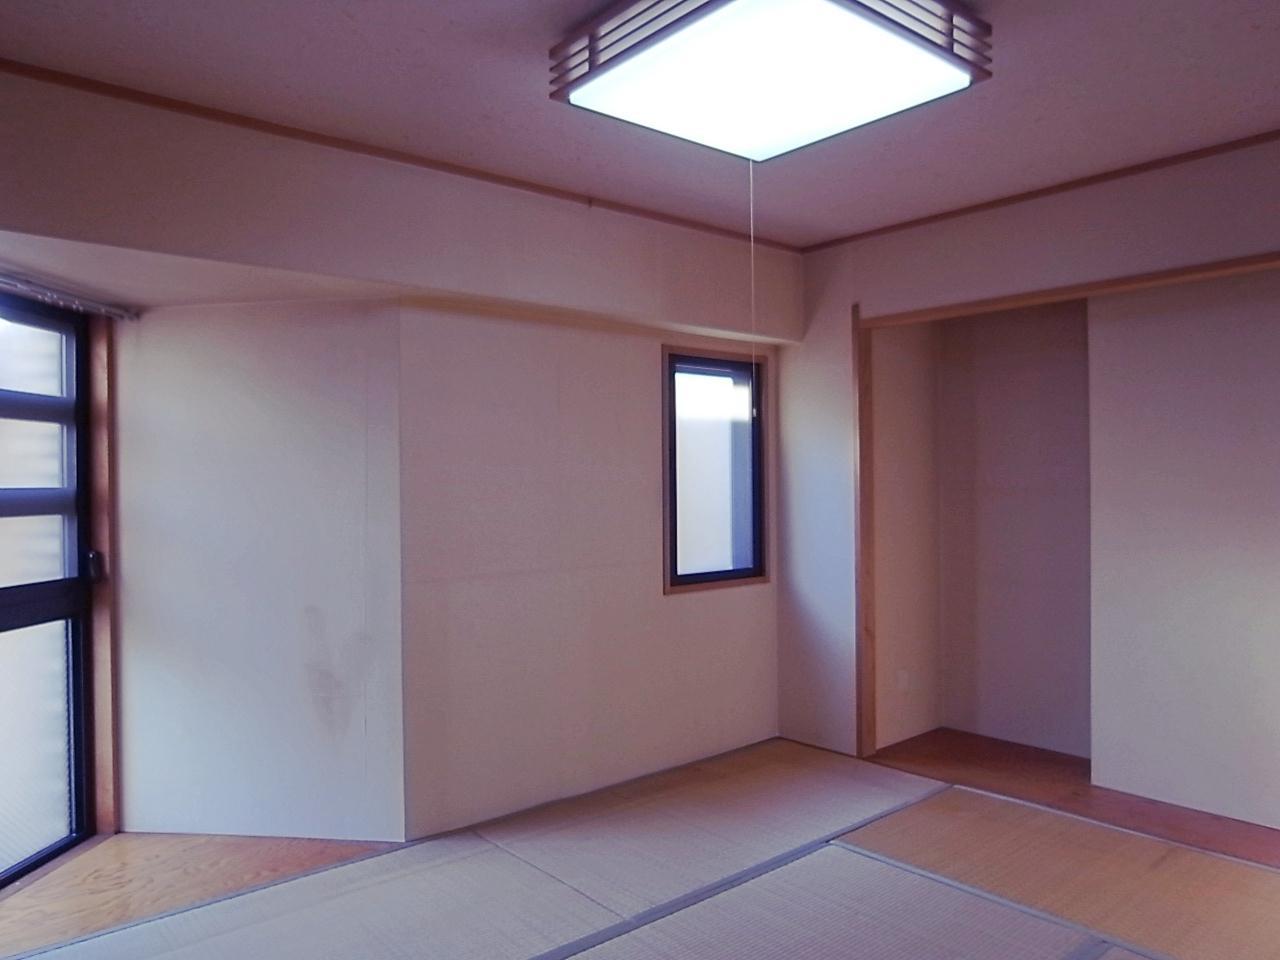 LDK横の和室。ここは空調付けられないのがネック。